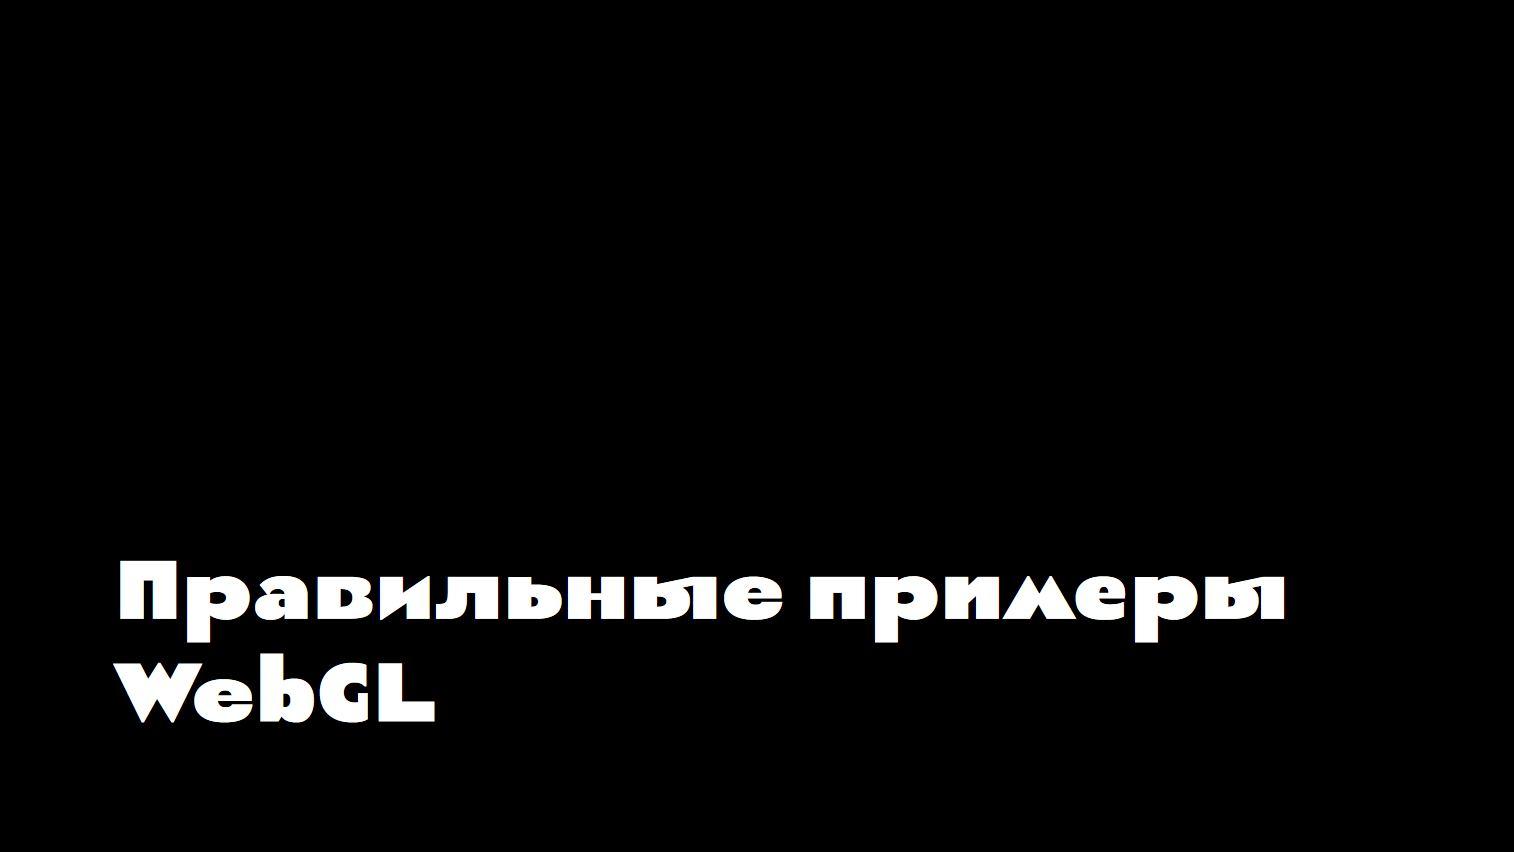 Дмитрий Ульмер-Морозов - WebGL - 11